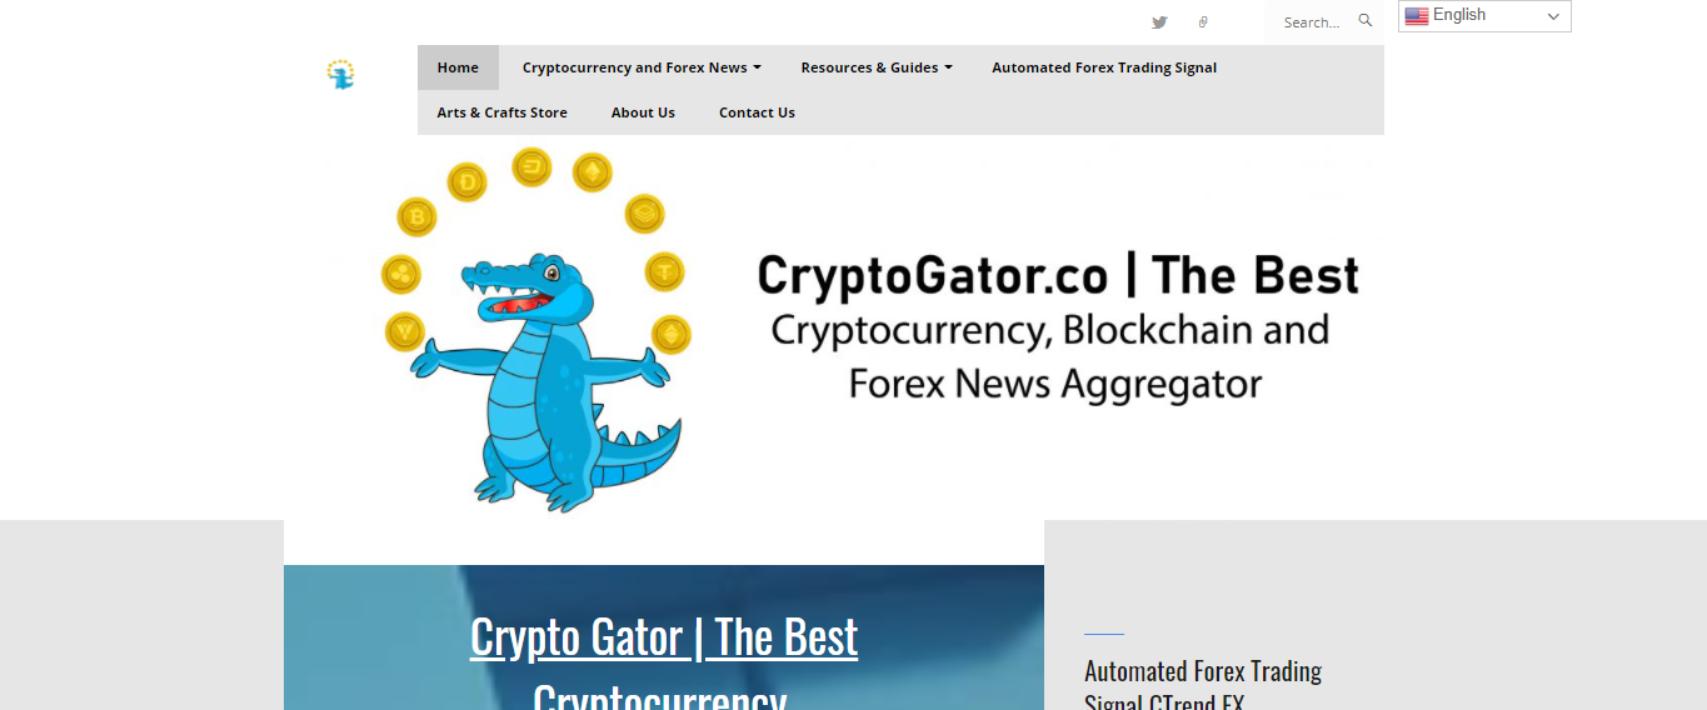 cryptogator.co